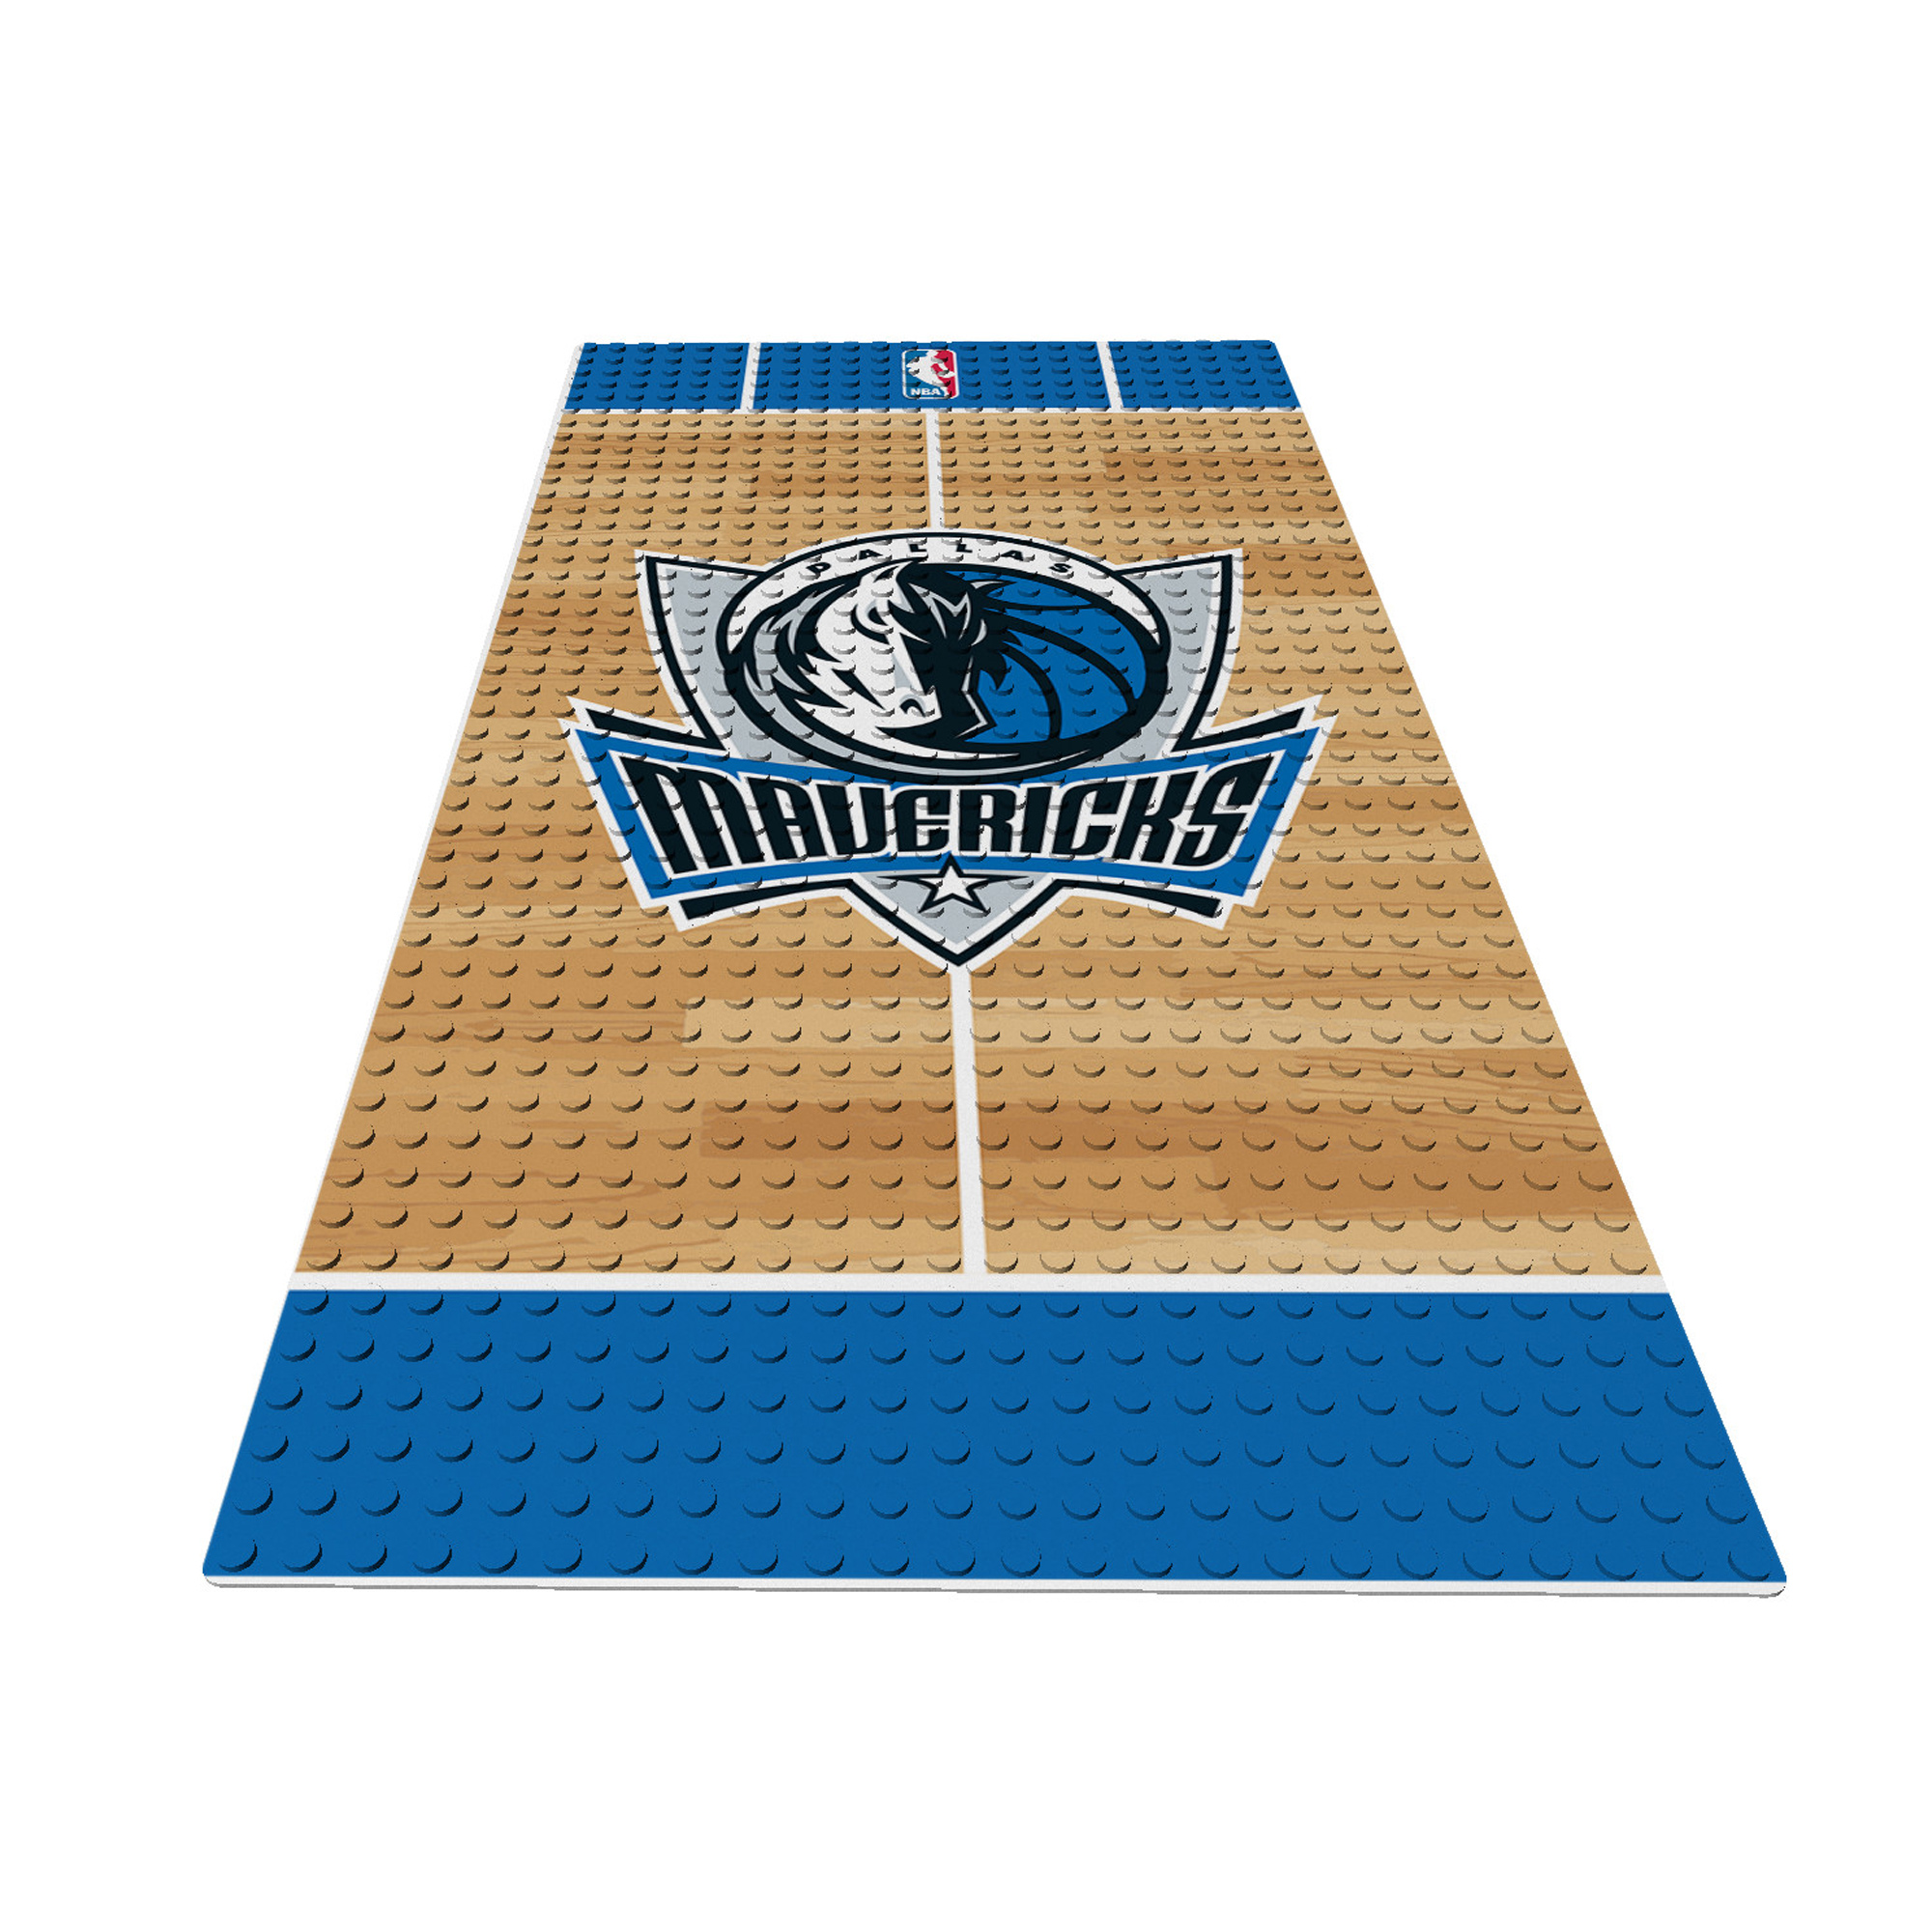 Dallas Mavericks OYO Sports Display Plate - No Size